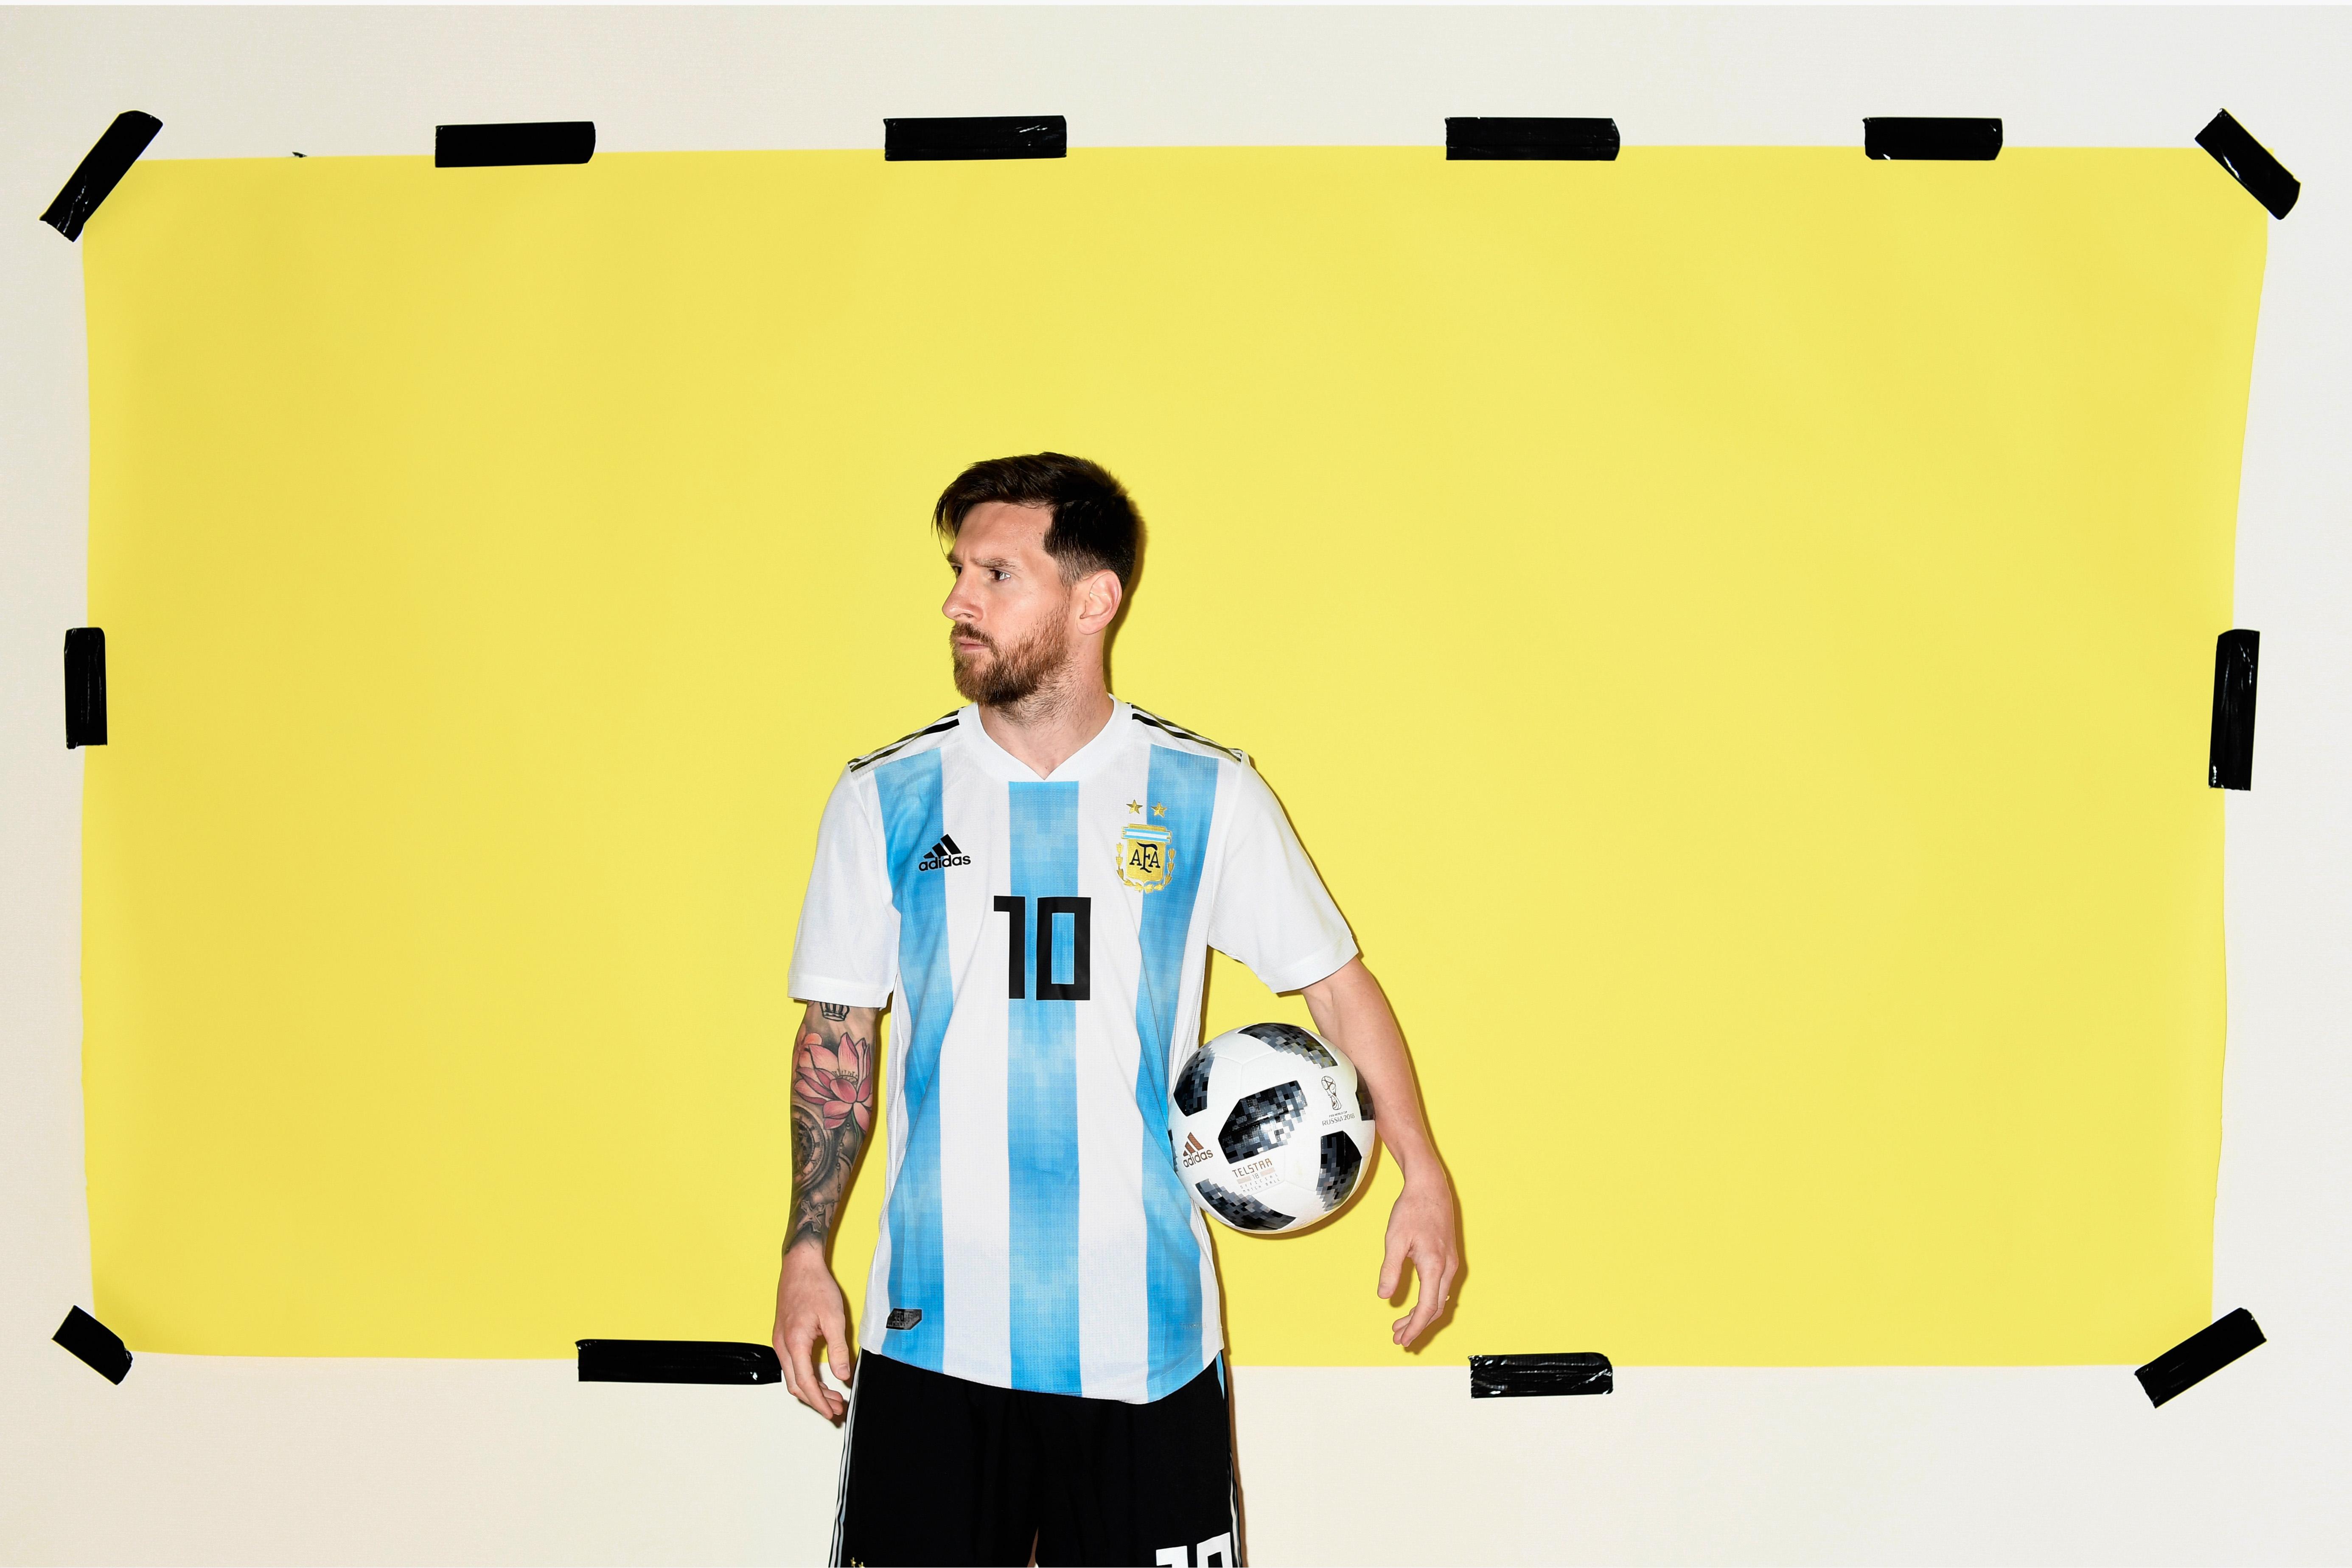 Lionel Messi Argentina Portrait 2018 Hd Sports 4k